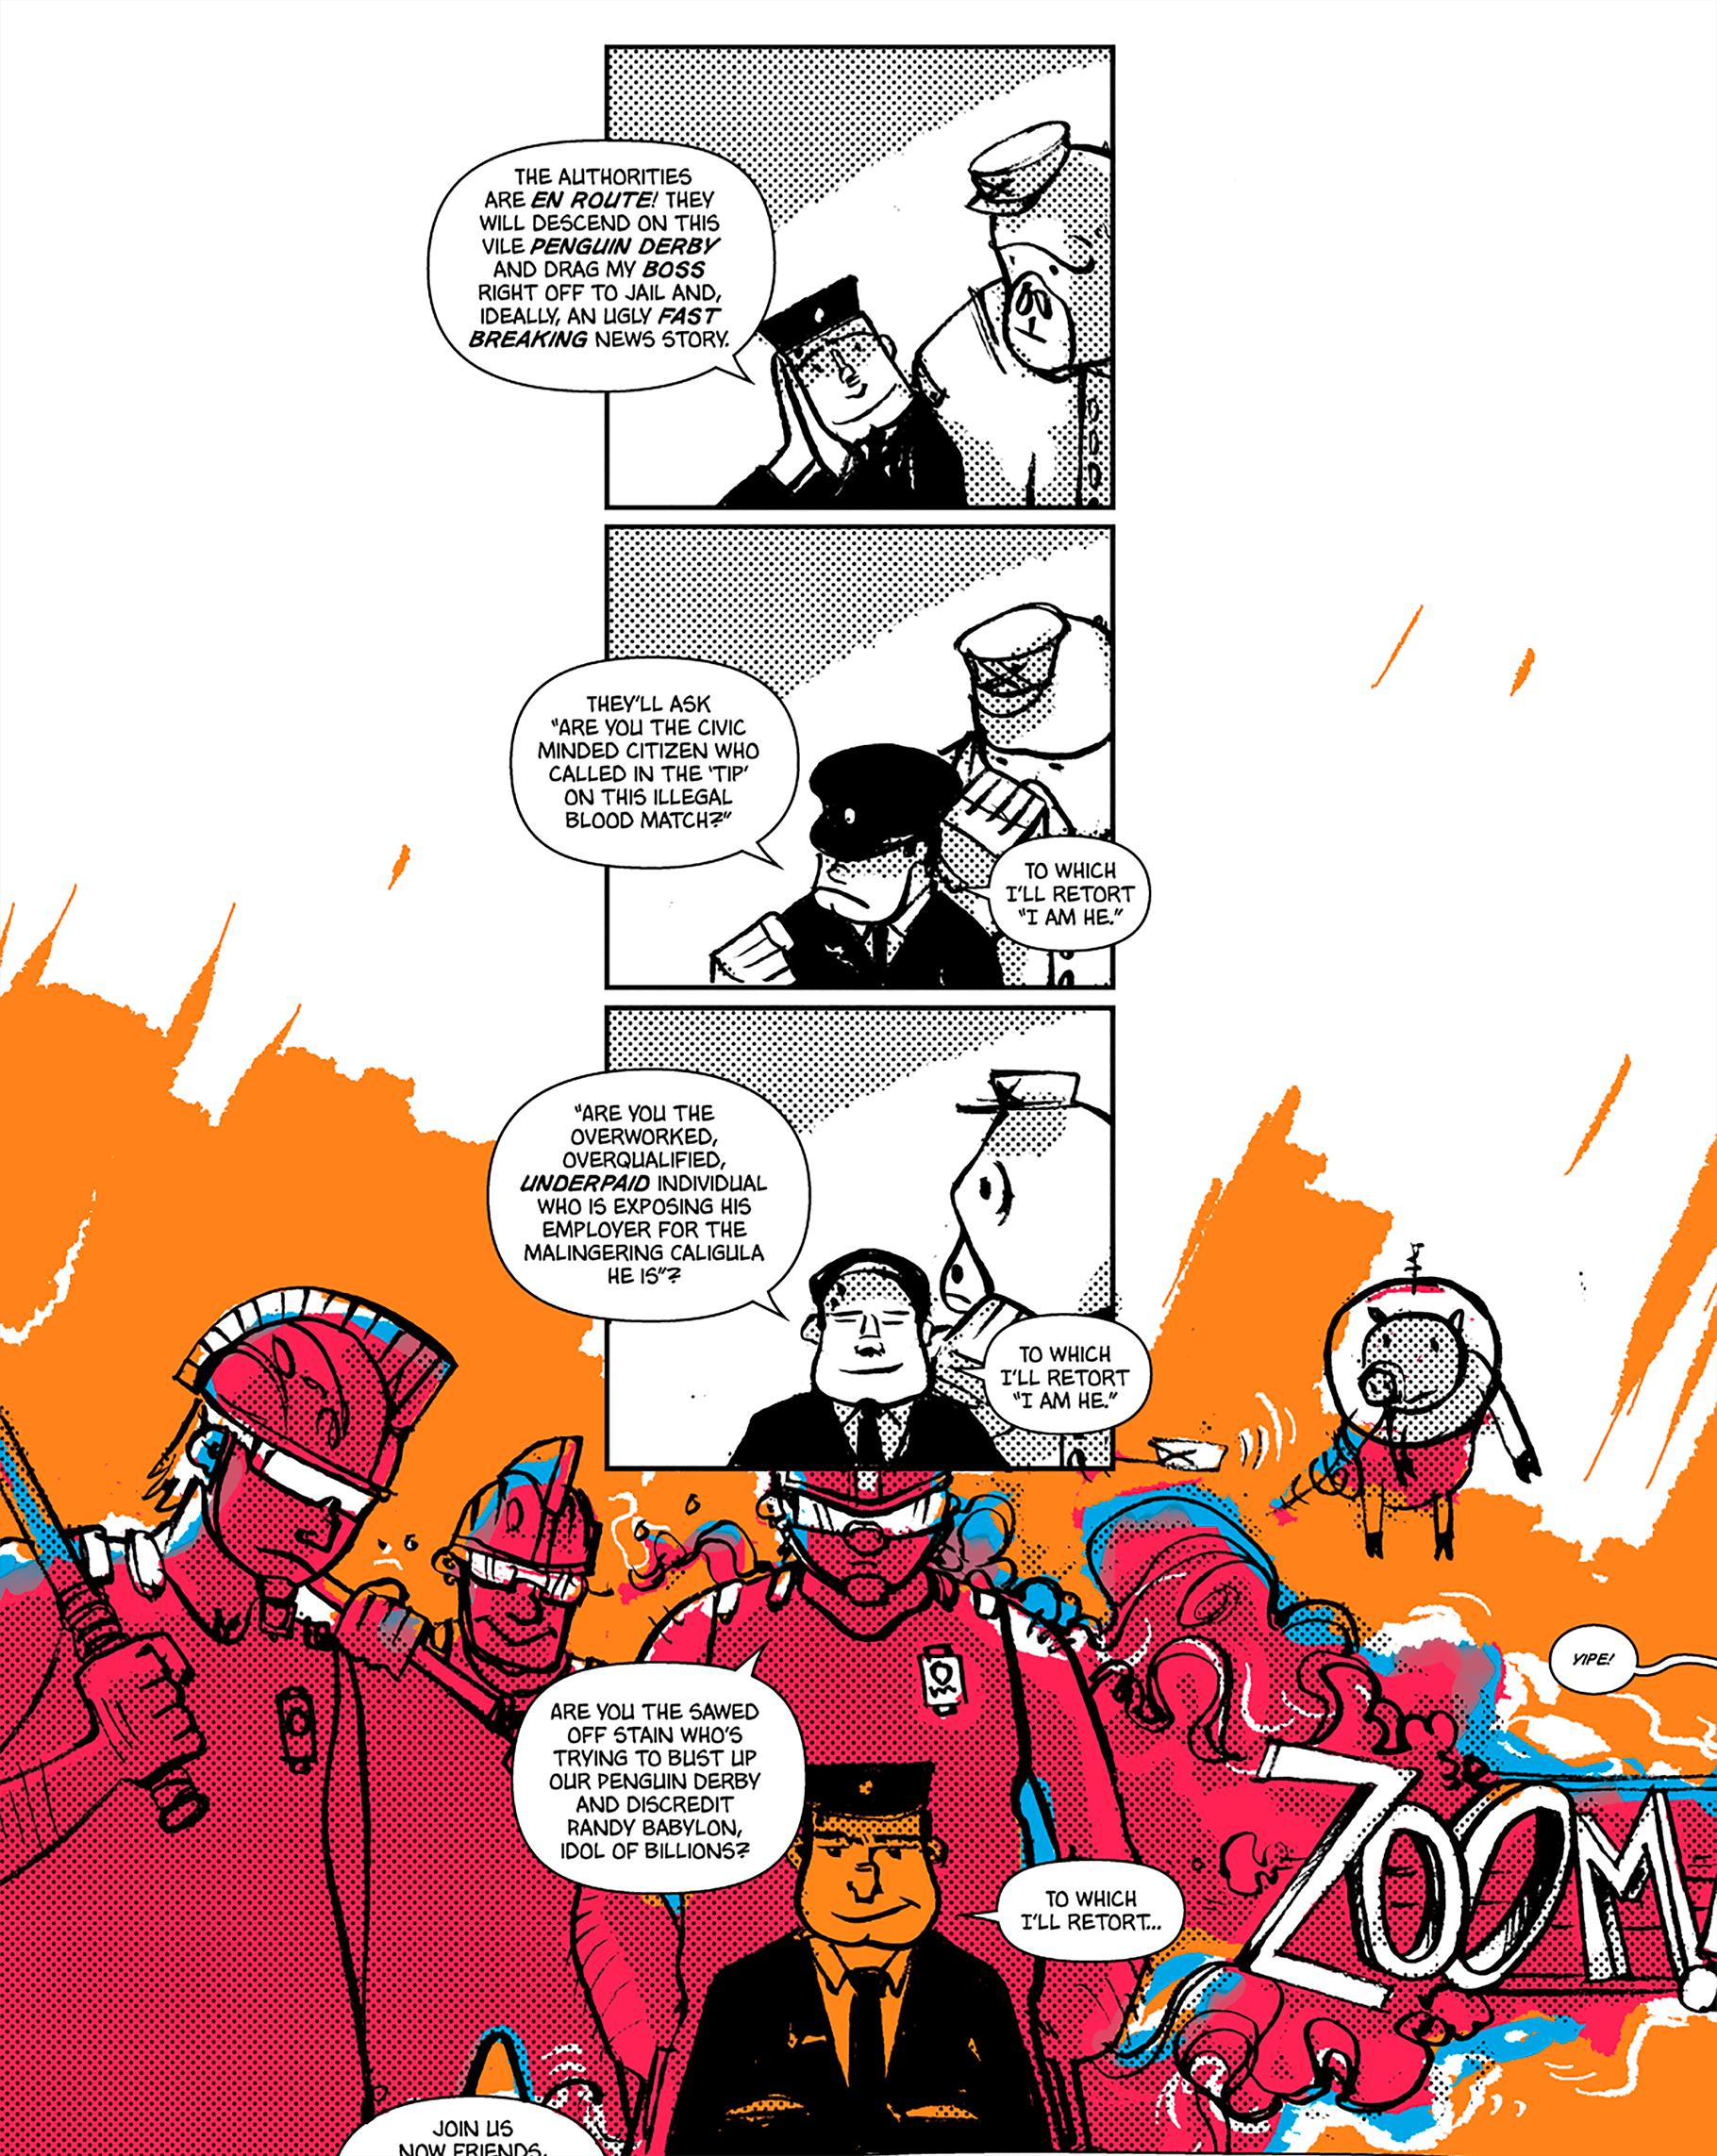 Randy Babylon page 7